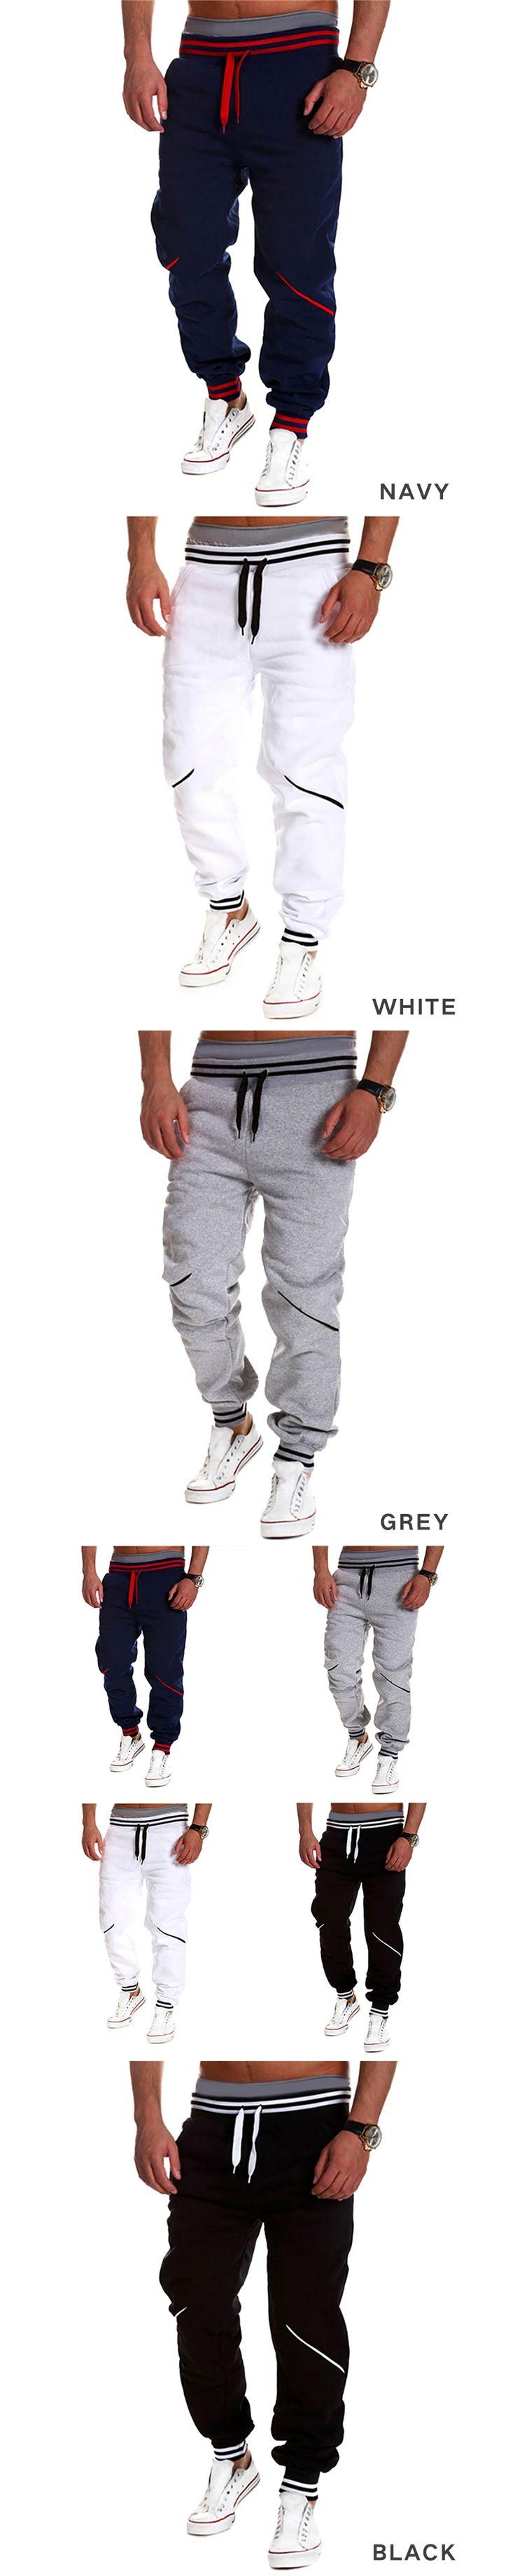 New casual mens joggers spliced pants new man hip hop long trousers Sweatpants pantalon homme white black